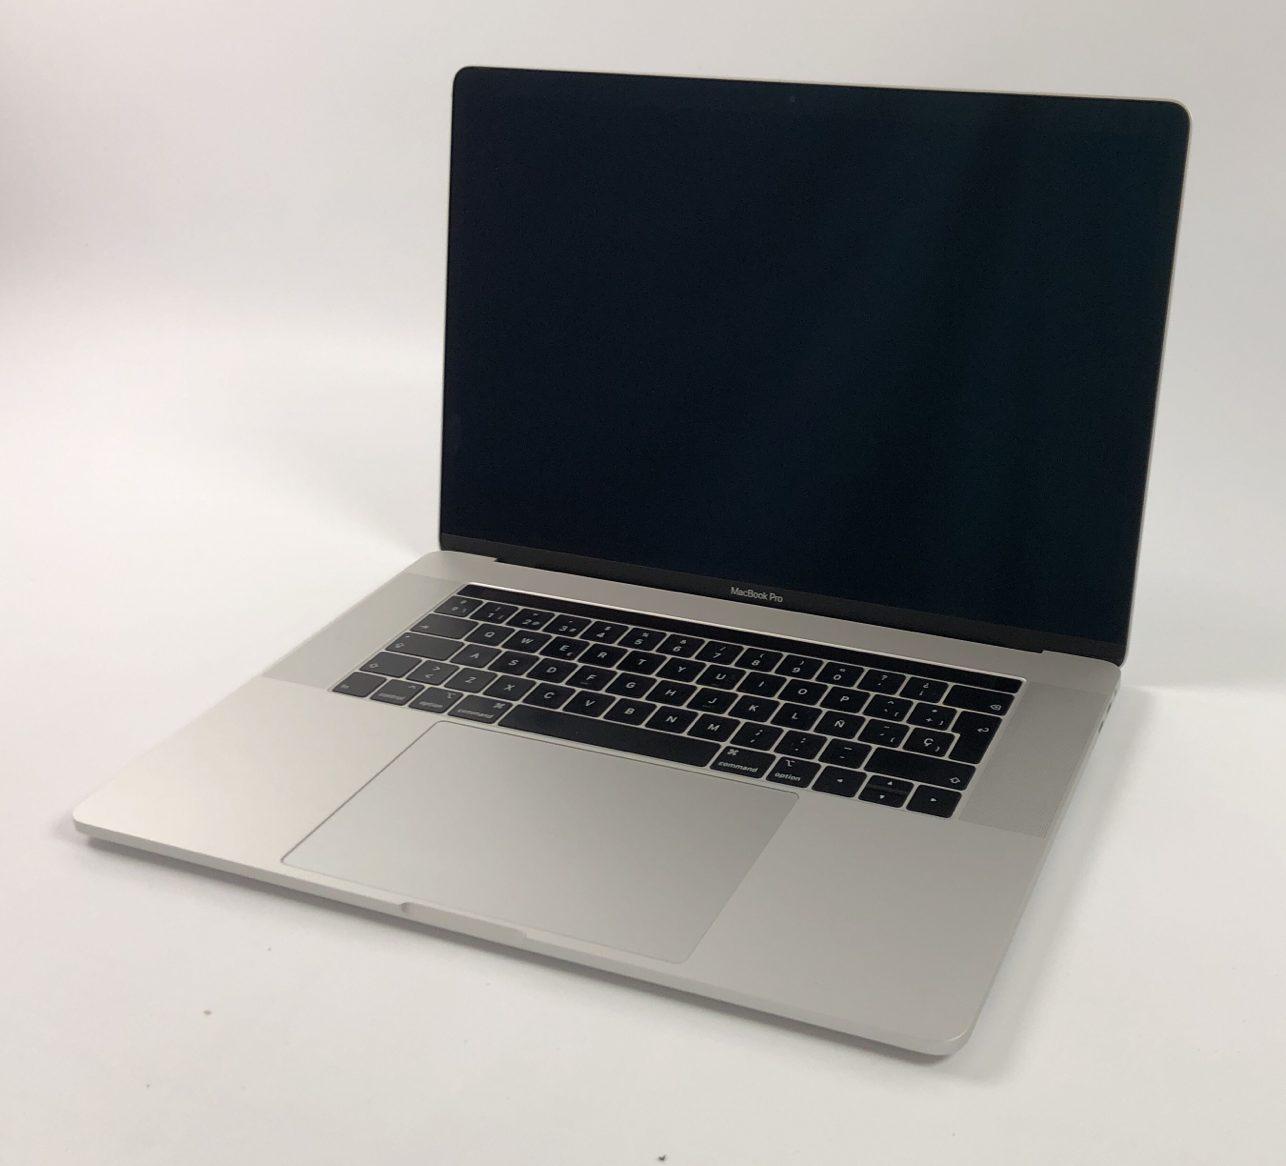 "MacBook Pro 15"" Touch Bar Mid 2018 (Intel 6-Core i7 2.2 GHz 16 GB RAM 512 GB SSD), Space Gray, Intel 6-Core i7 2.2 GHz, 16 GB RAM, 512 GB SSD, imagen 1"